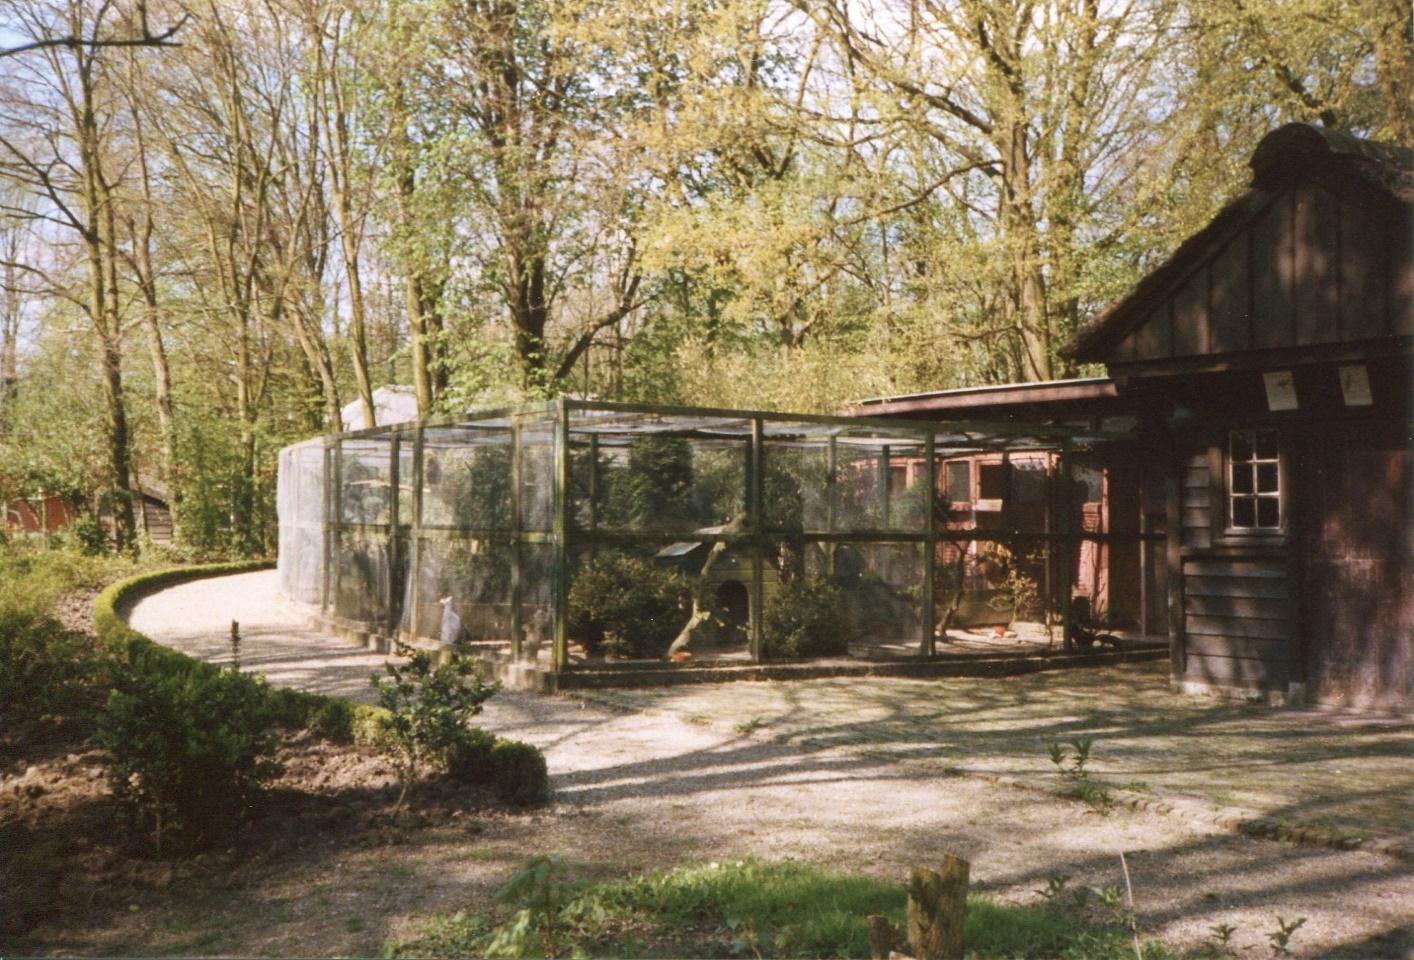 Stichting Nyenrode Fonds - Menagerie - Fazanterie, historische foto 1988 (3)